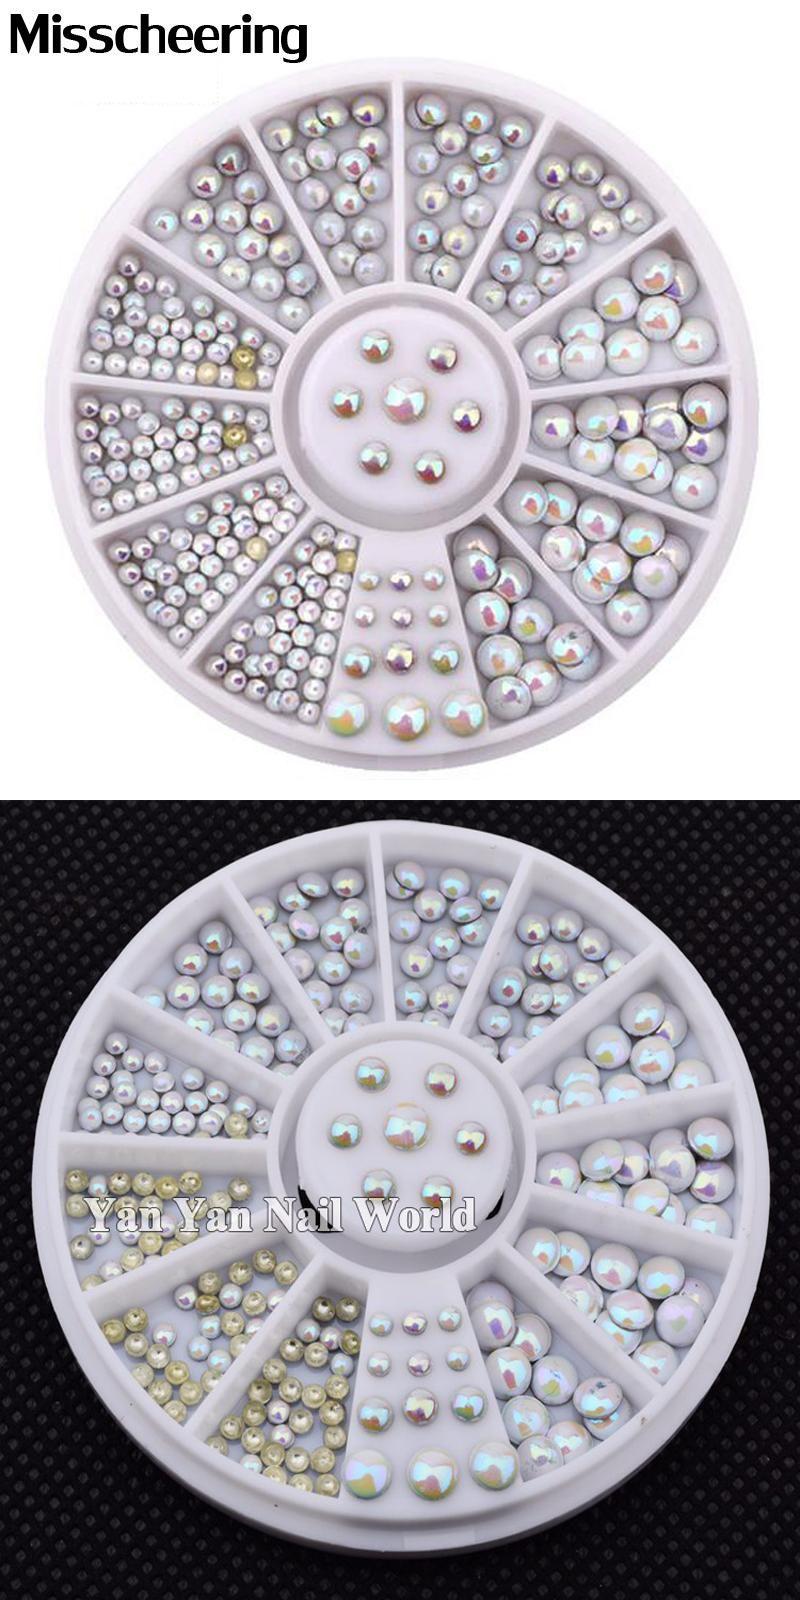 3d Nail Art where to buy 3d nail art supplies : Visit to Buy] Hot Mix Sizes Round Nail Studs Tips Wheel 3d Nail ...